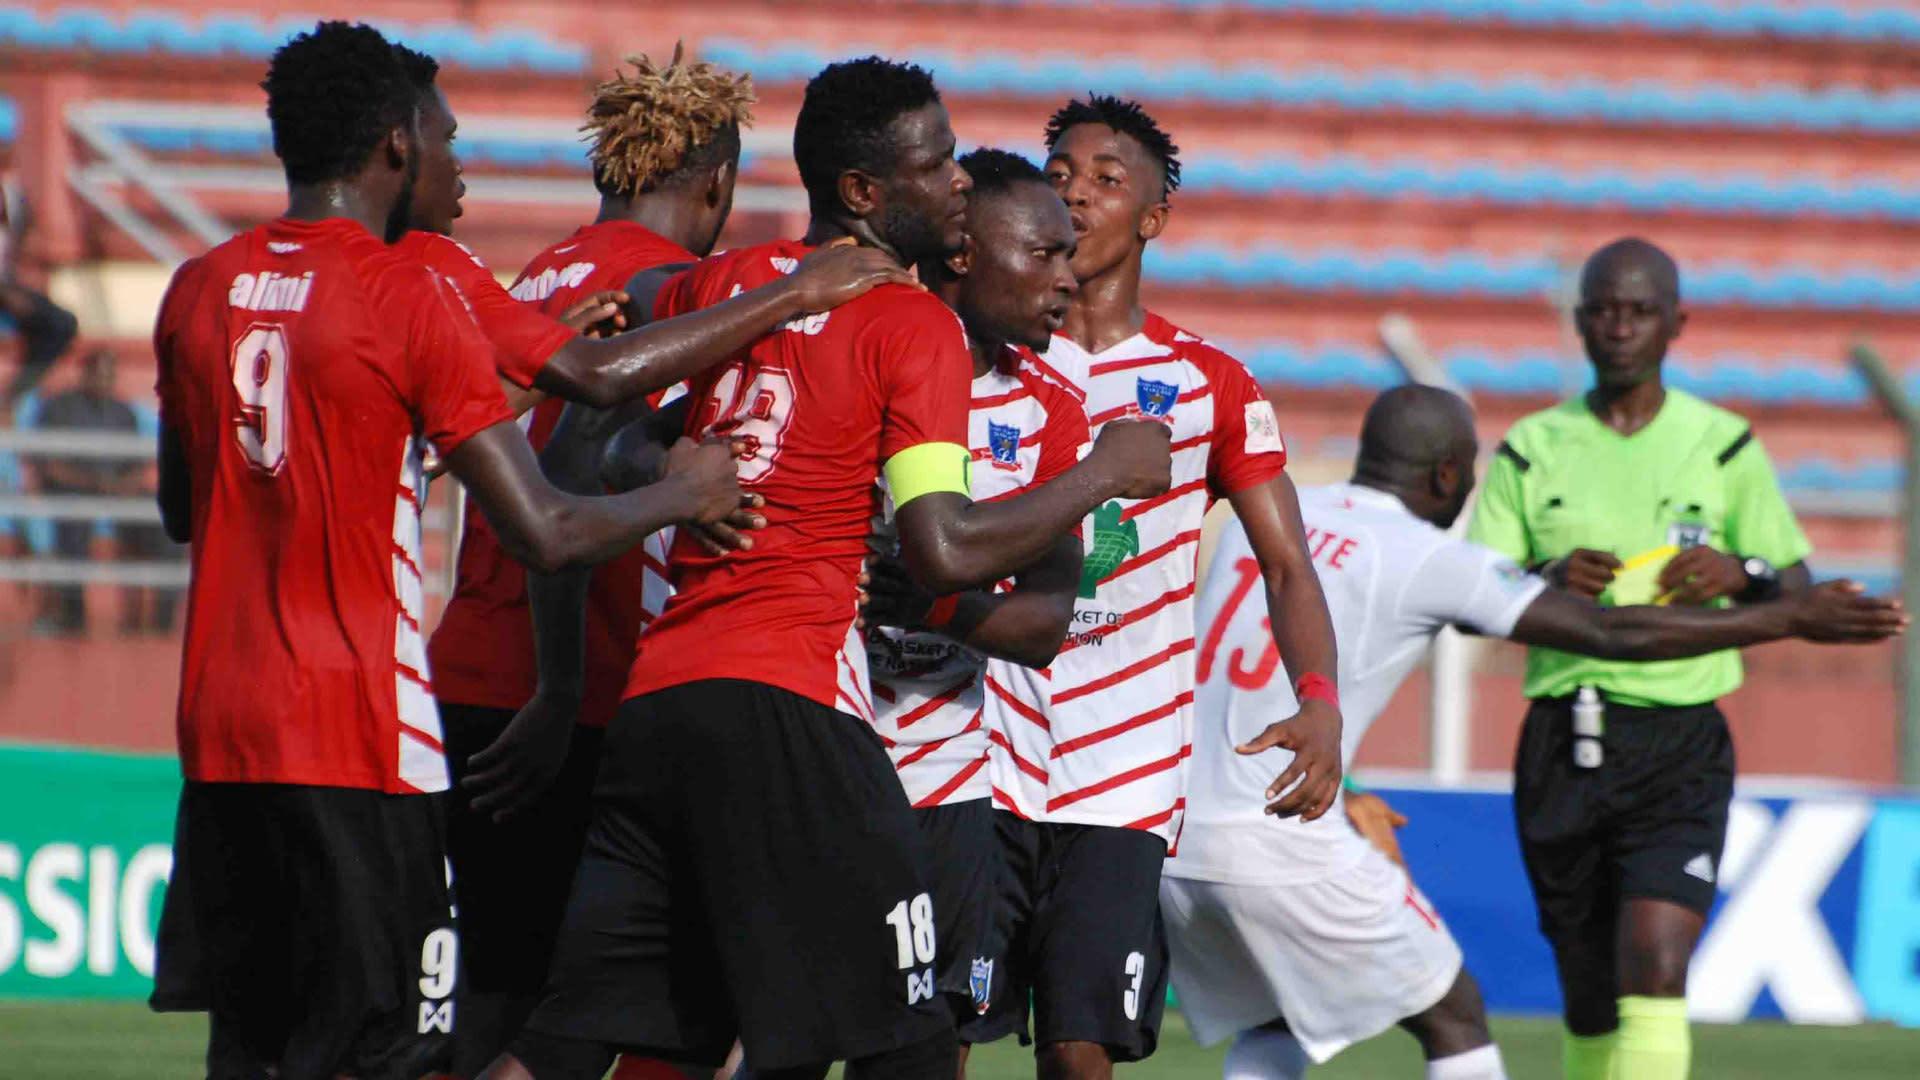 NPFL Wrap: Lobi Stars and Kano Pillars draw closer to playoff spots